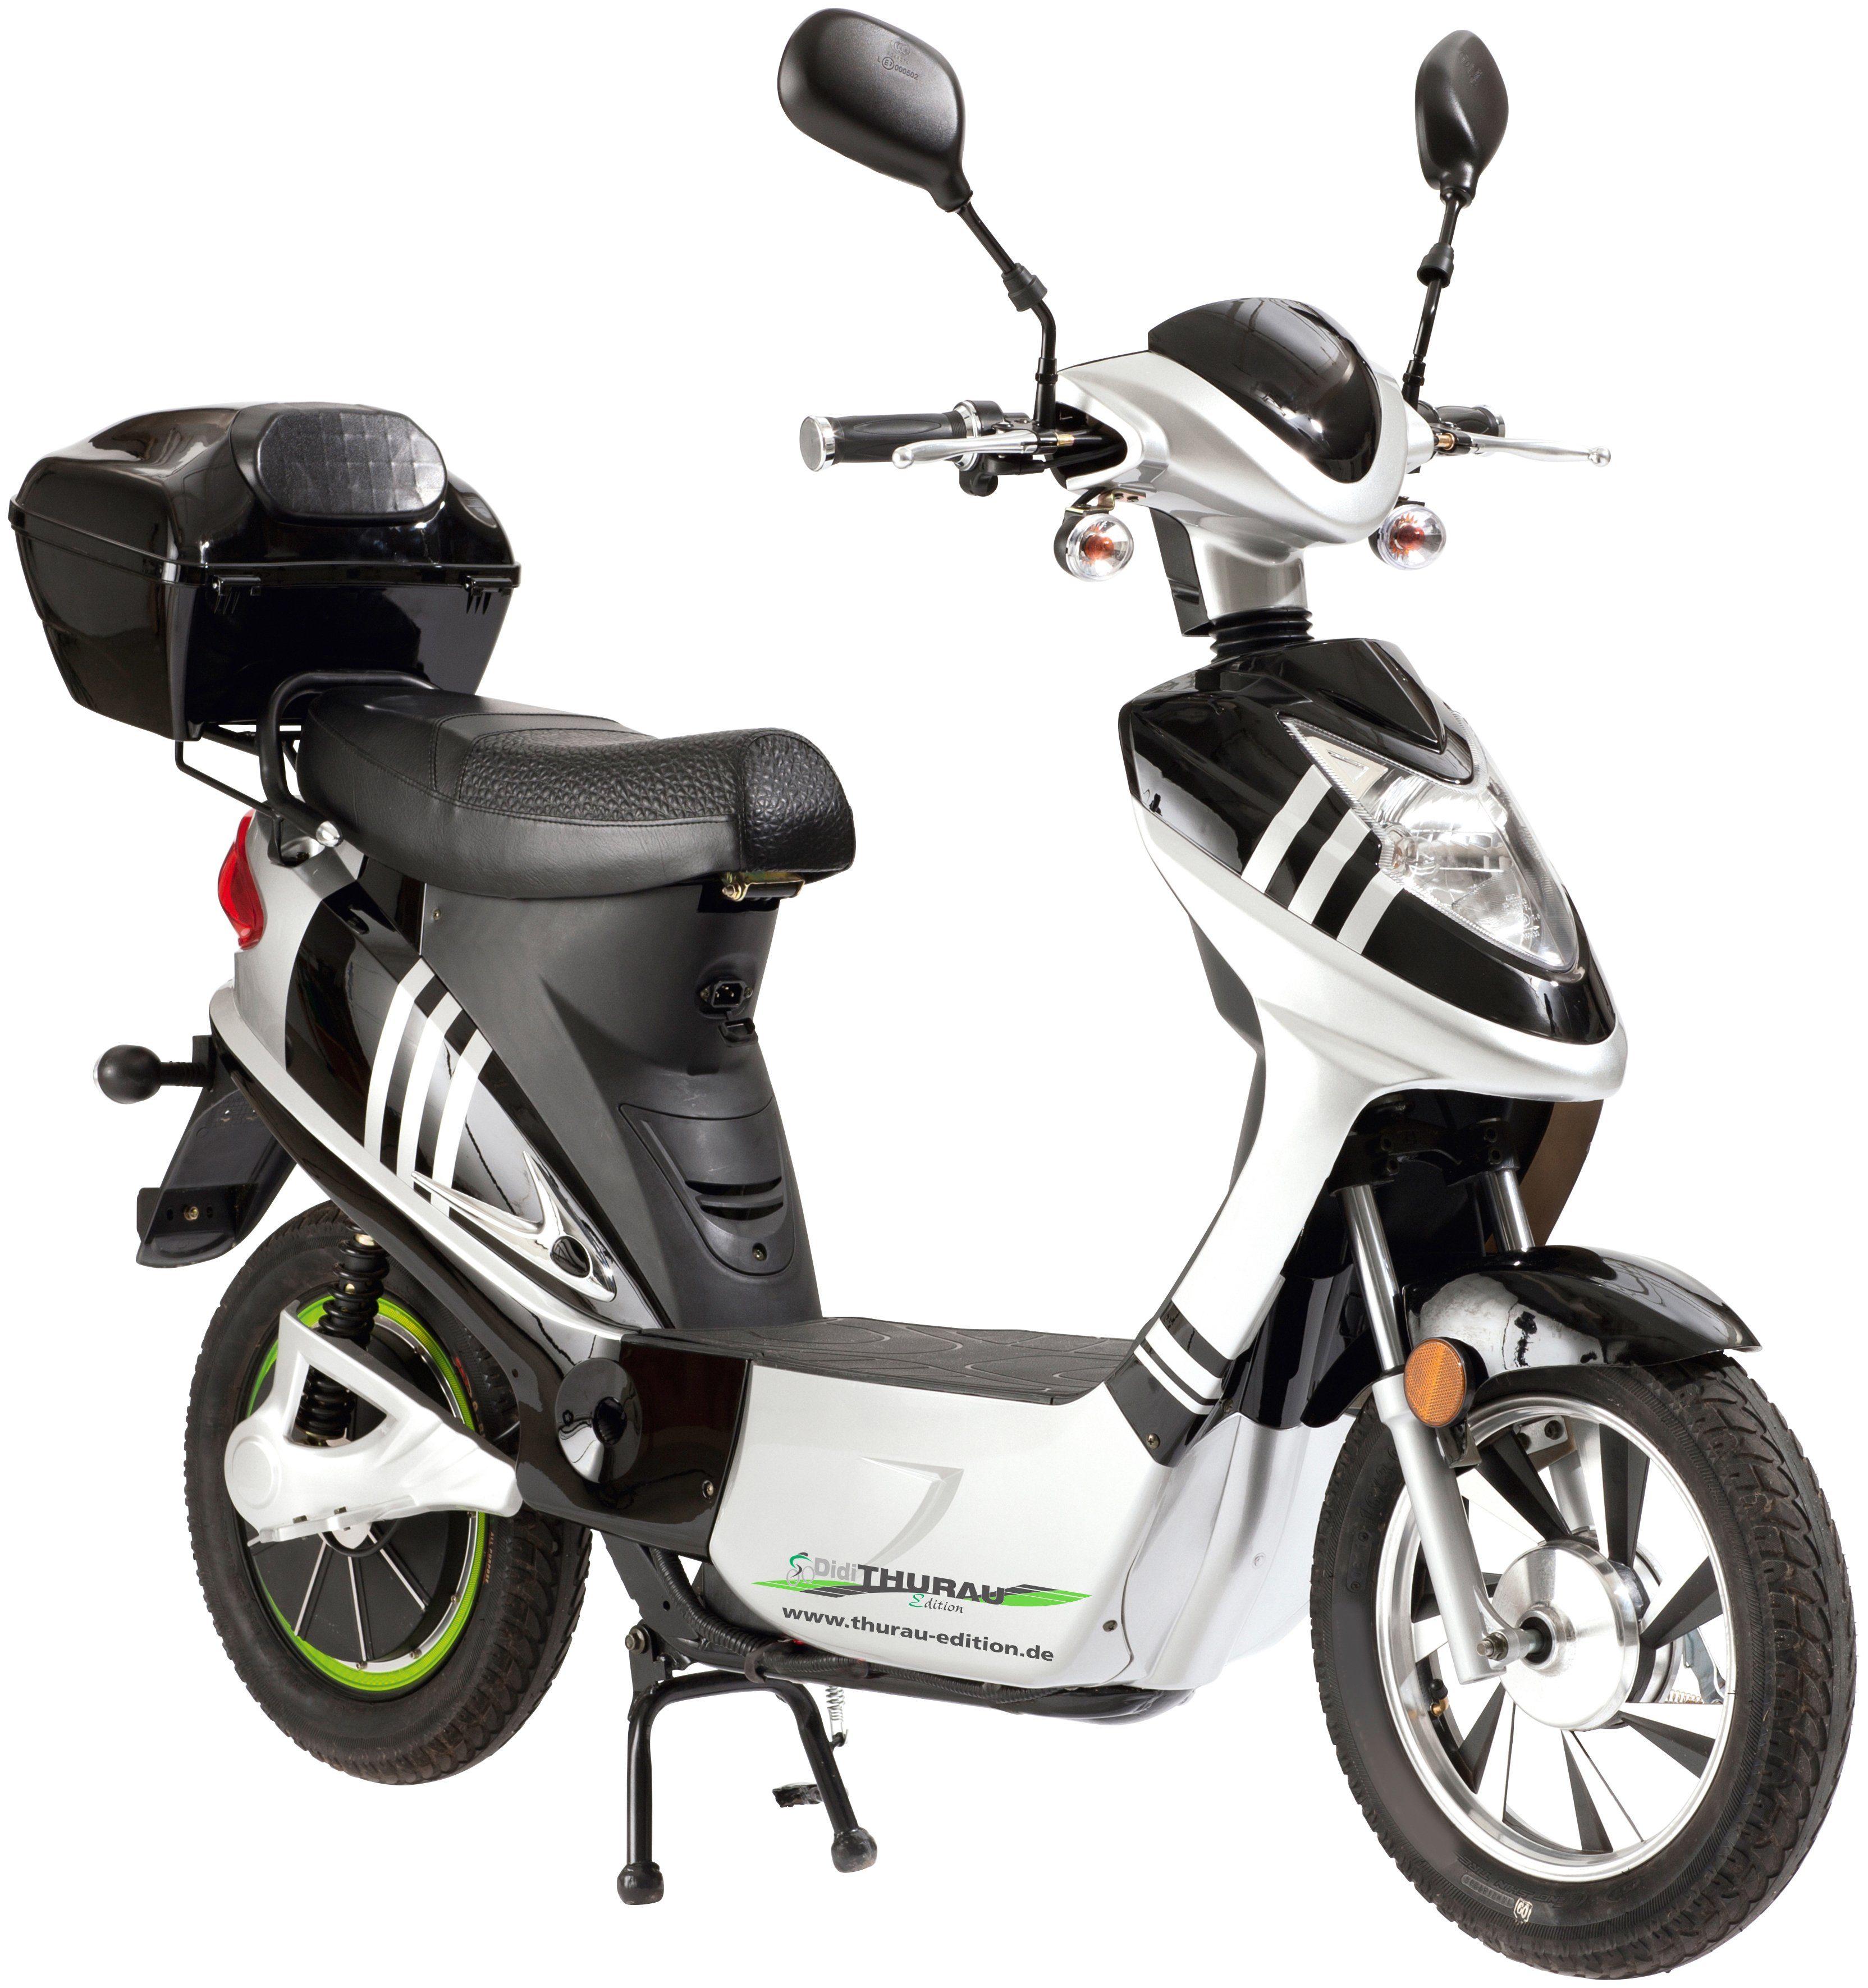 DIDI THURAU Elektroroller »City Star Plus«, 40 km/h, Inkl. Rundum-Sorglos-Paket